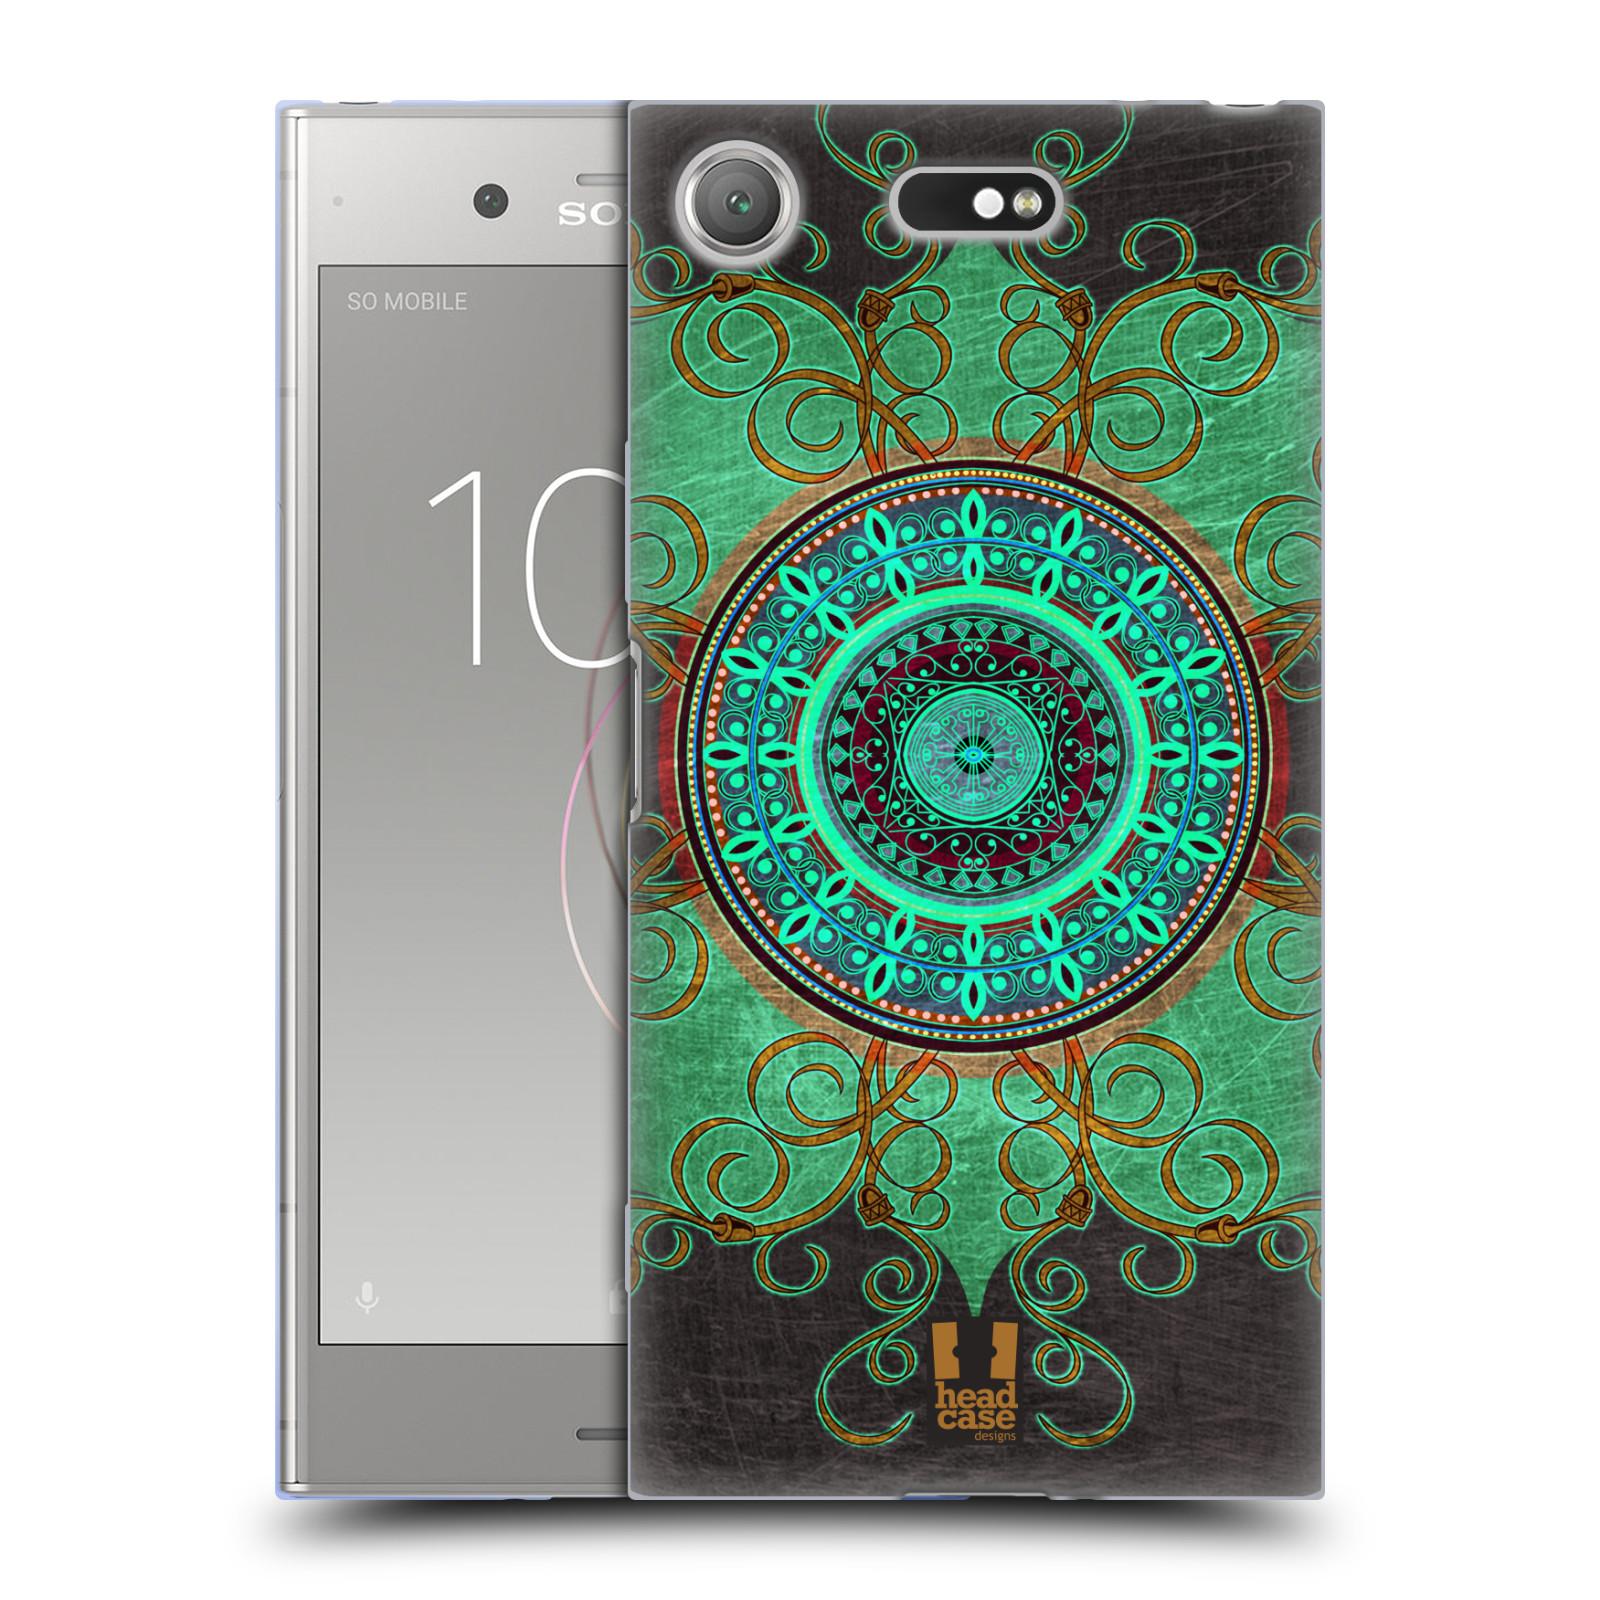 Silikonové pouzdro na mobil Sony Xperia XZ1 Compact - Head Case - ARAB MANDALA